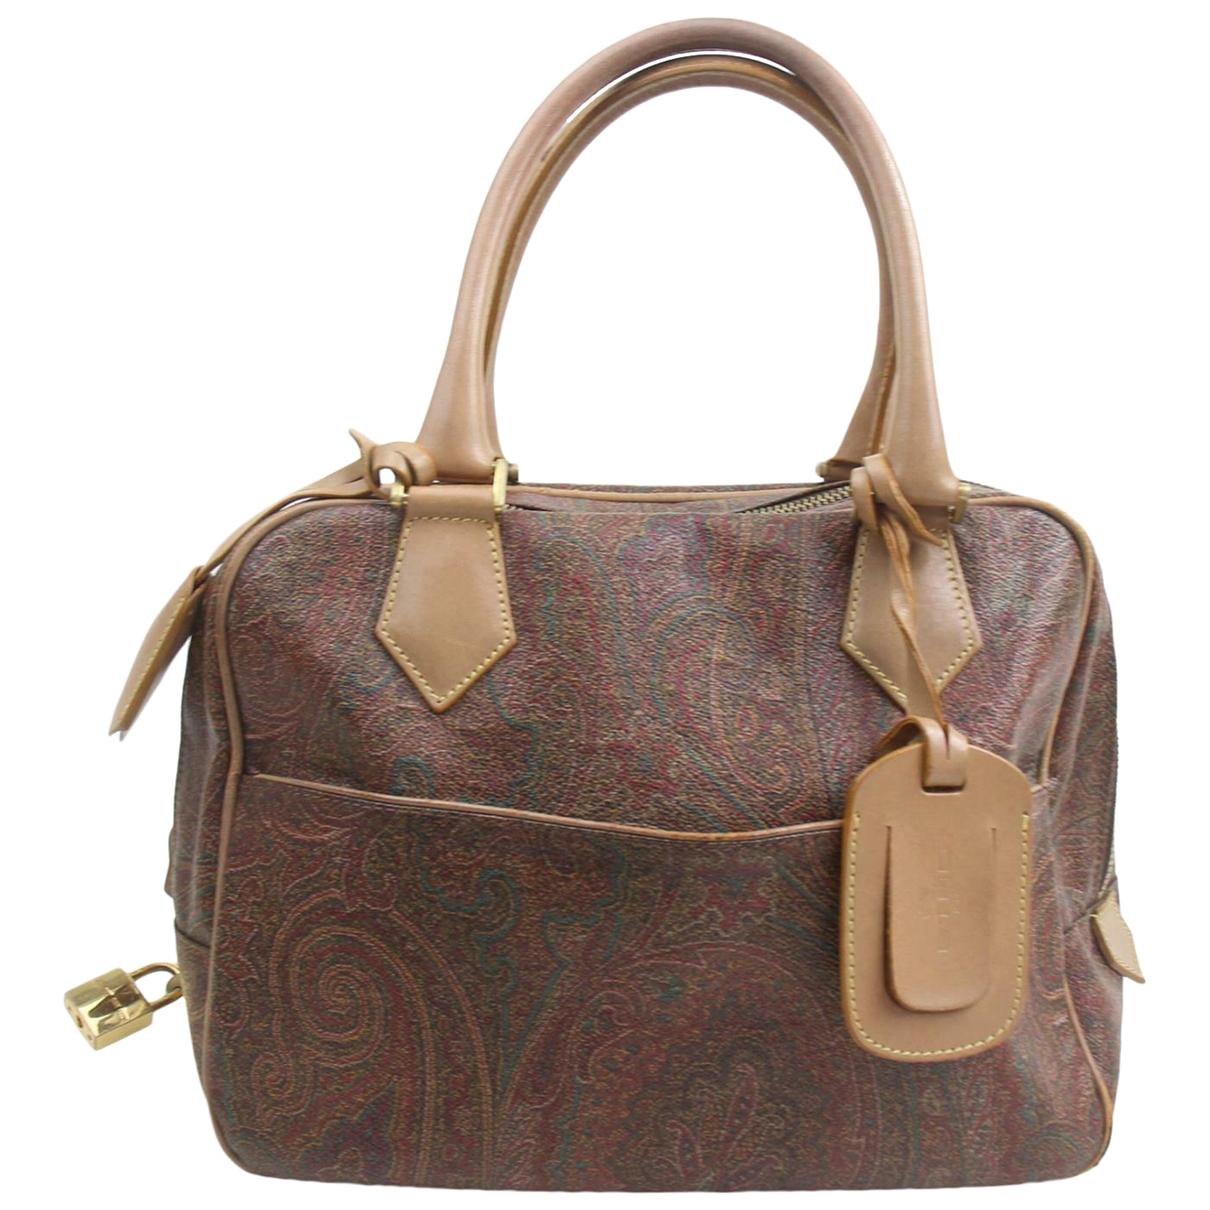 Etro \N Brown handbag for Women \N